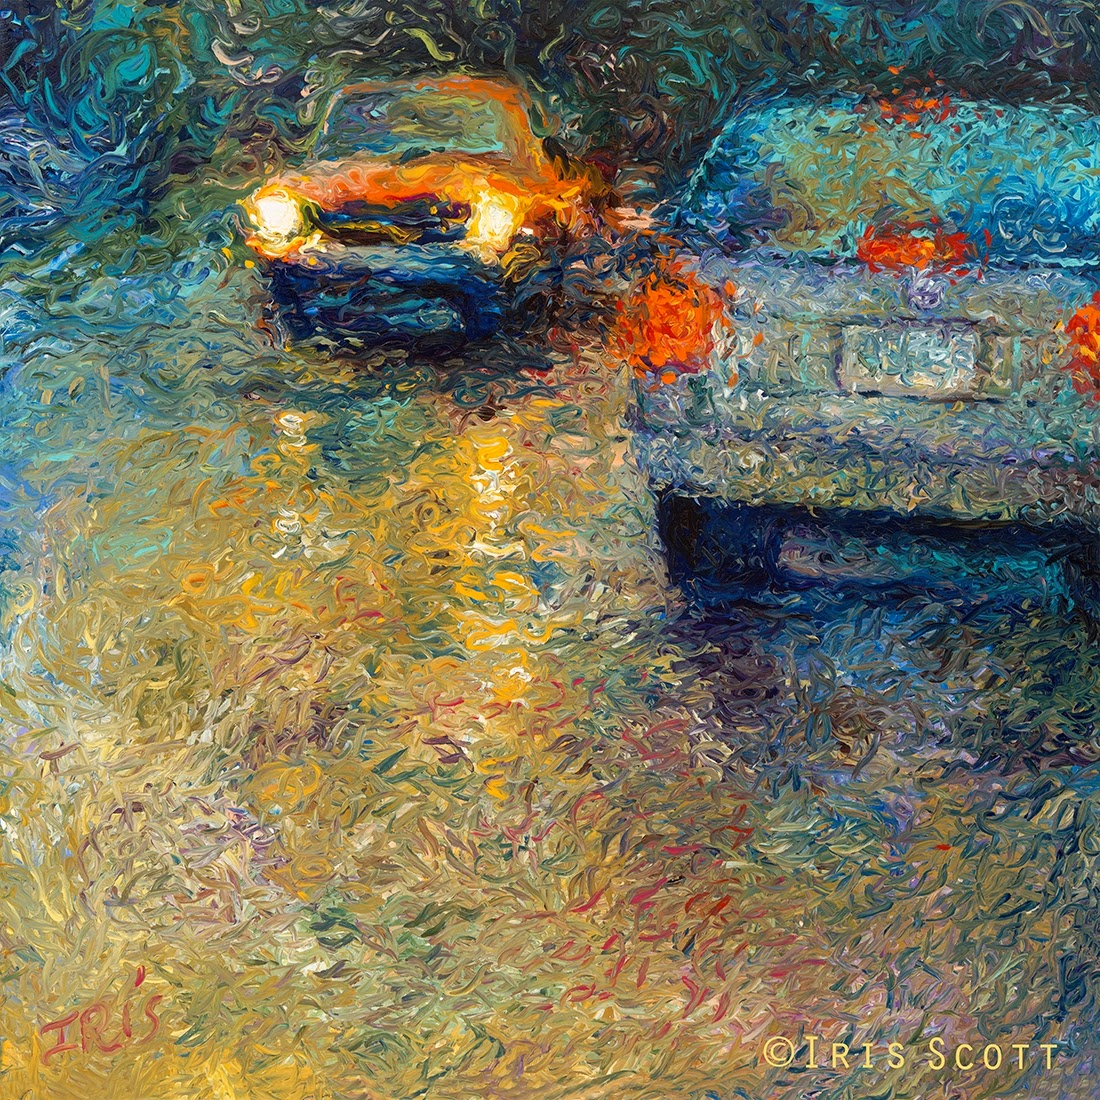 14-Volkswagen-Blue-Iris-Scott-Finger-Painting-Fine-Art-www-designstack-co